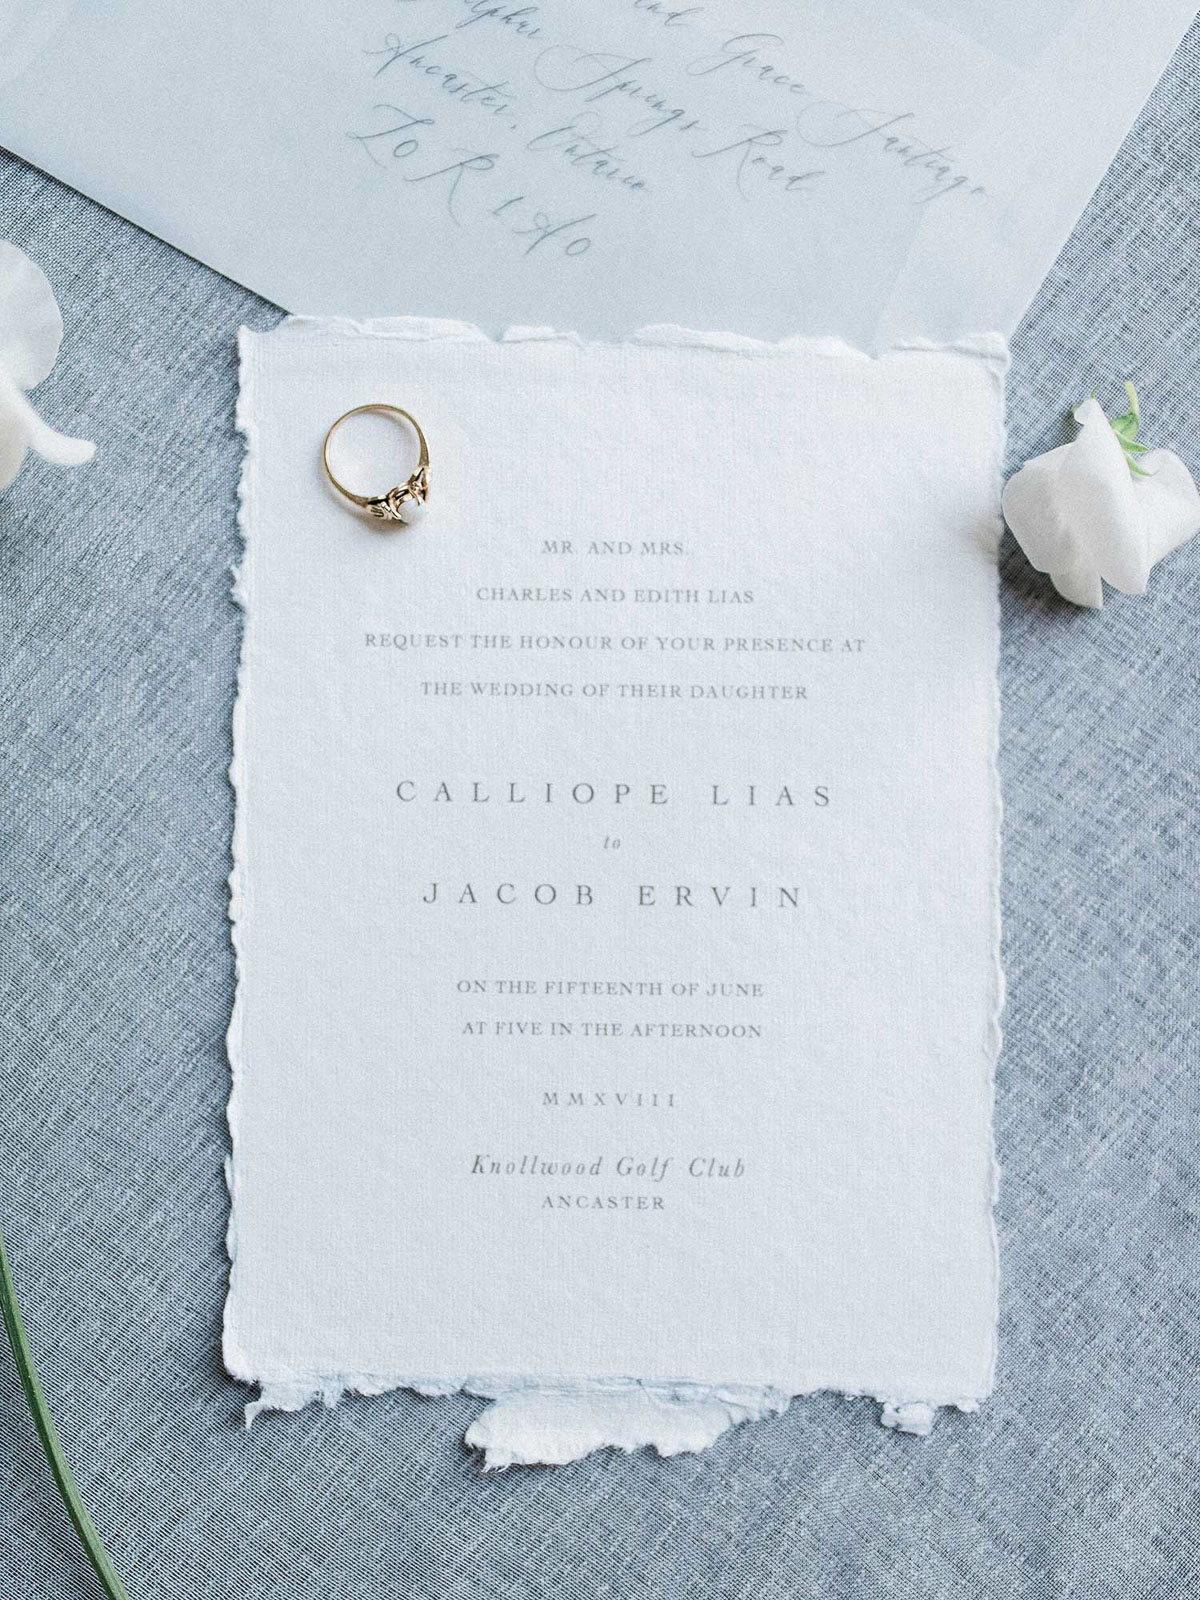 destiny-dawn-photography-vineyard-bride-swish-list-knollwood-golf-and-country-club-ancaster-wedding-editorial-35.jpg